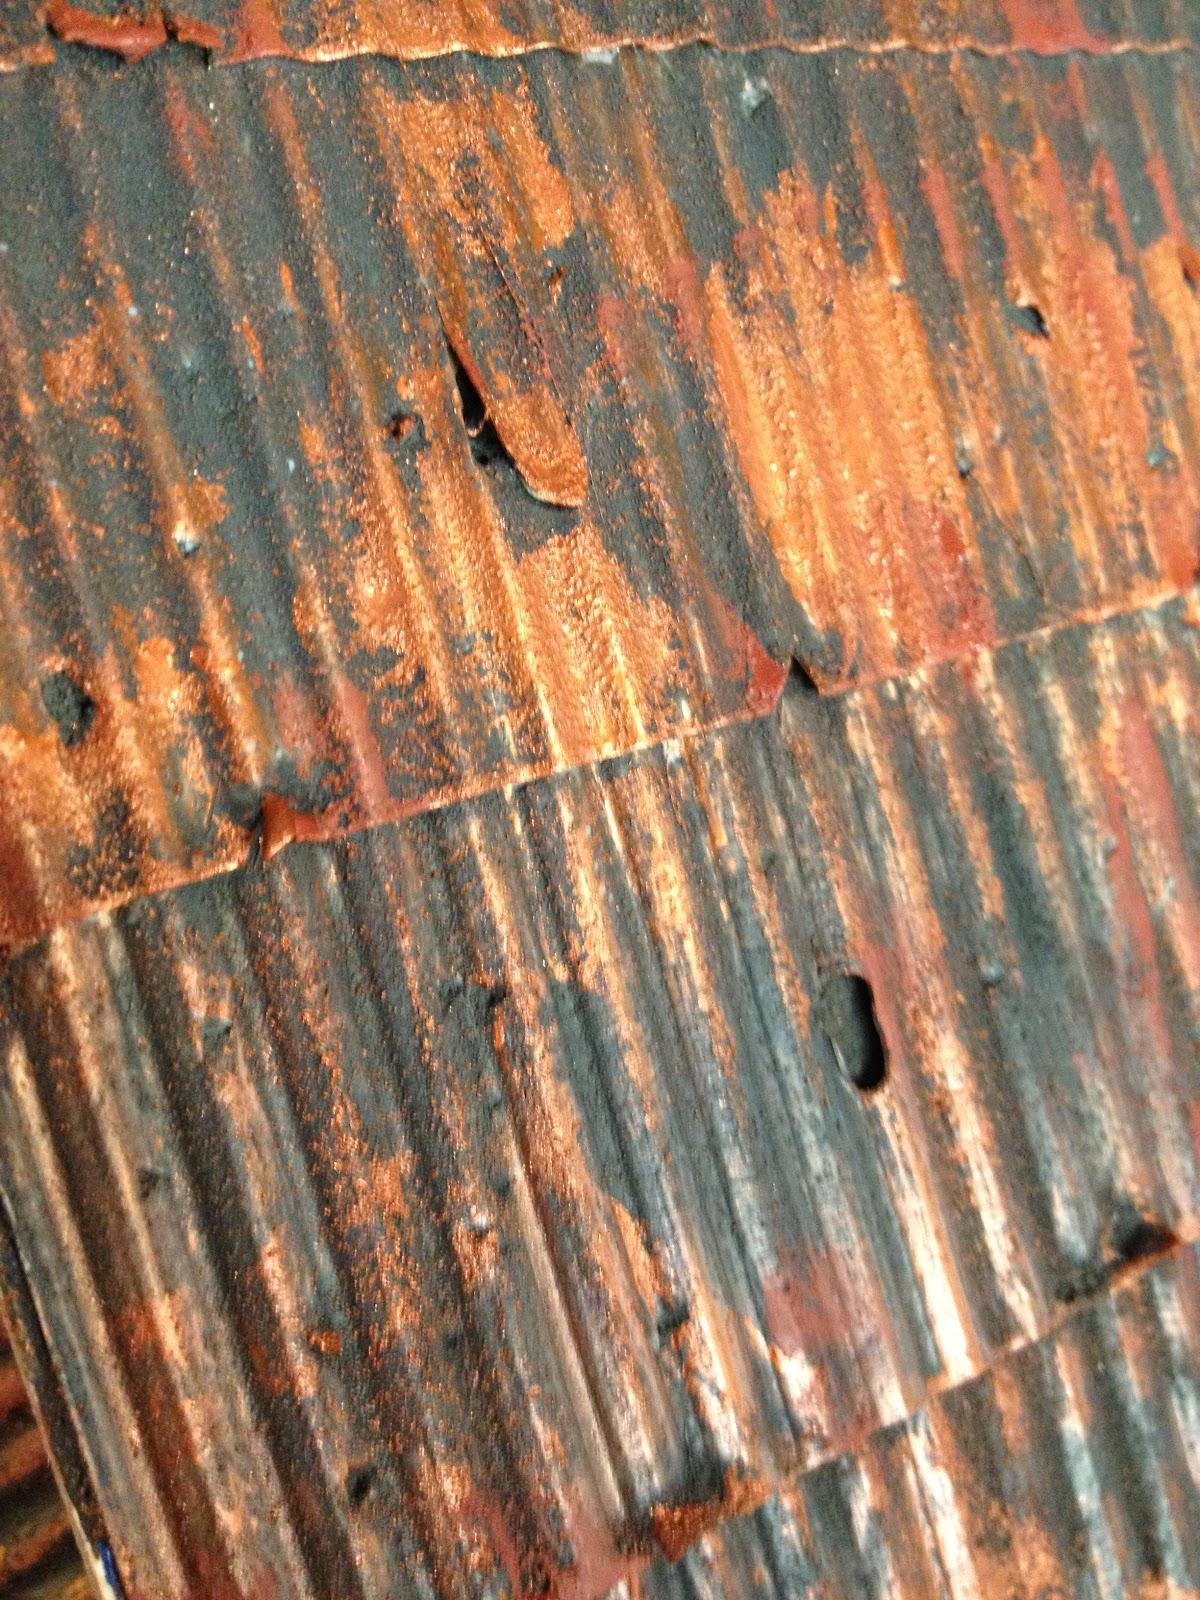 Paint For Rusty Metal Roof - koukuujinja.net